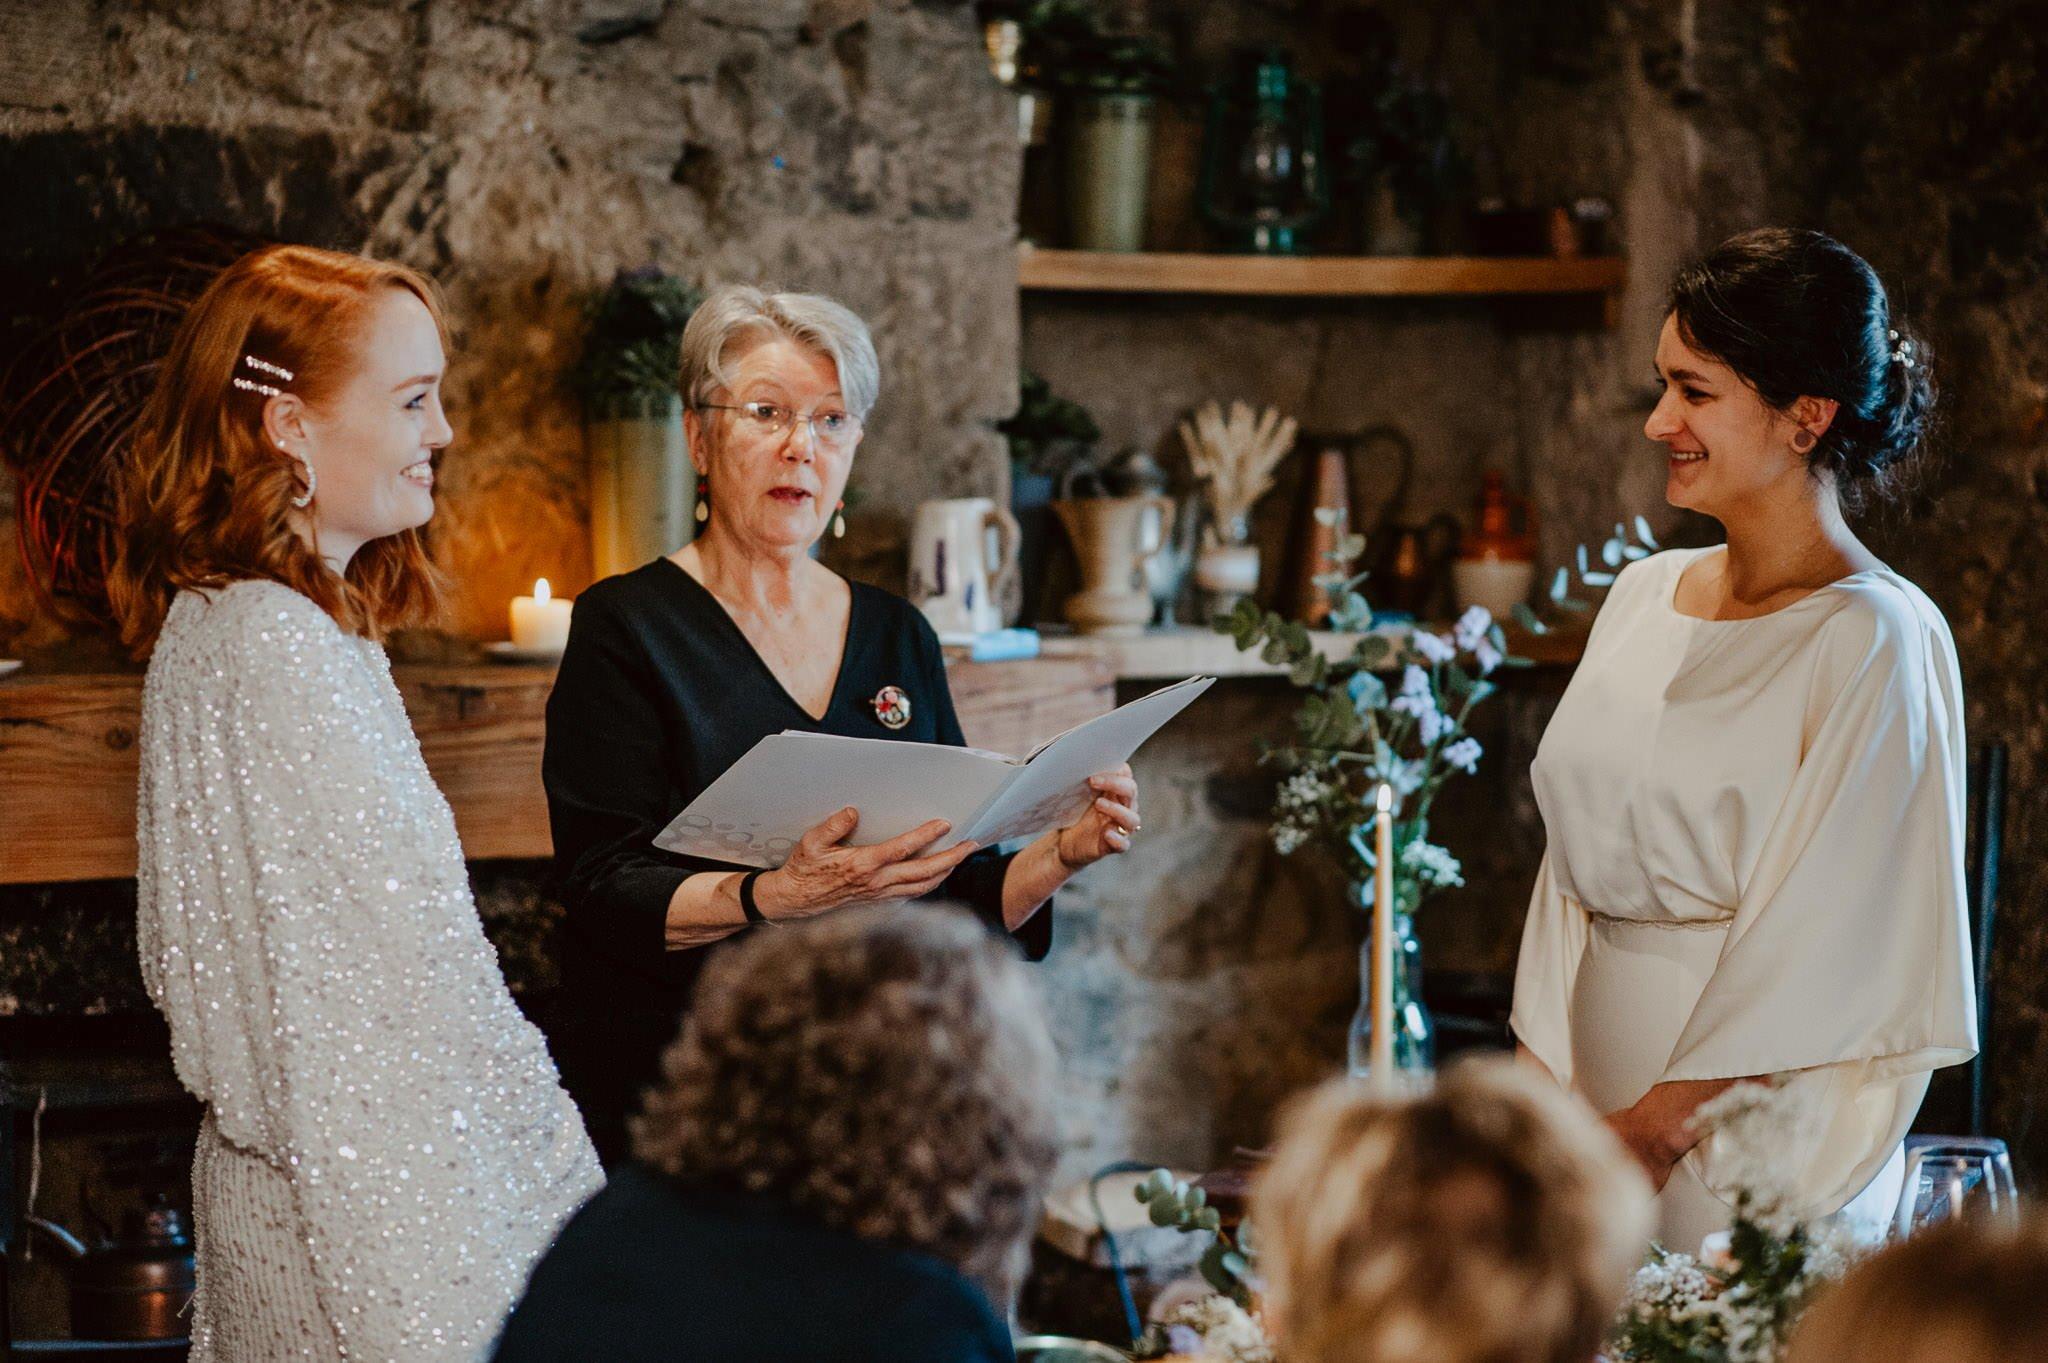 A Dreamy Pre-Raphaelite Wedding at the Bothy in Glasgow 27